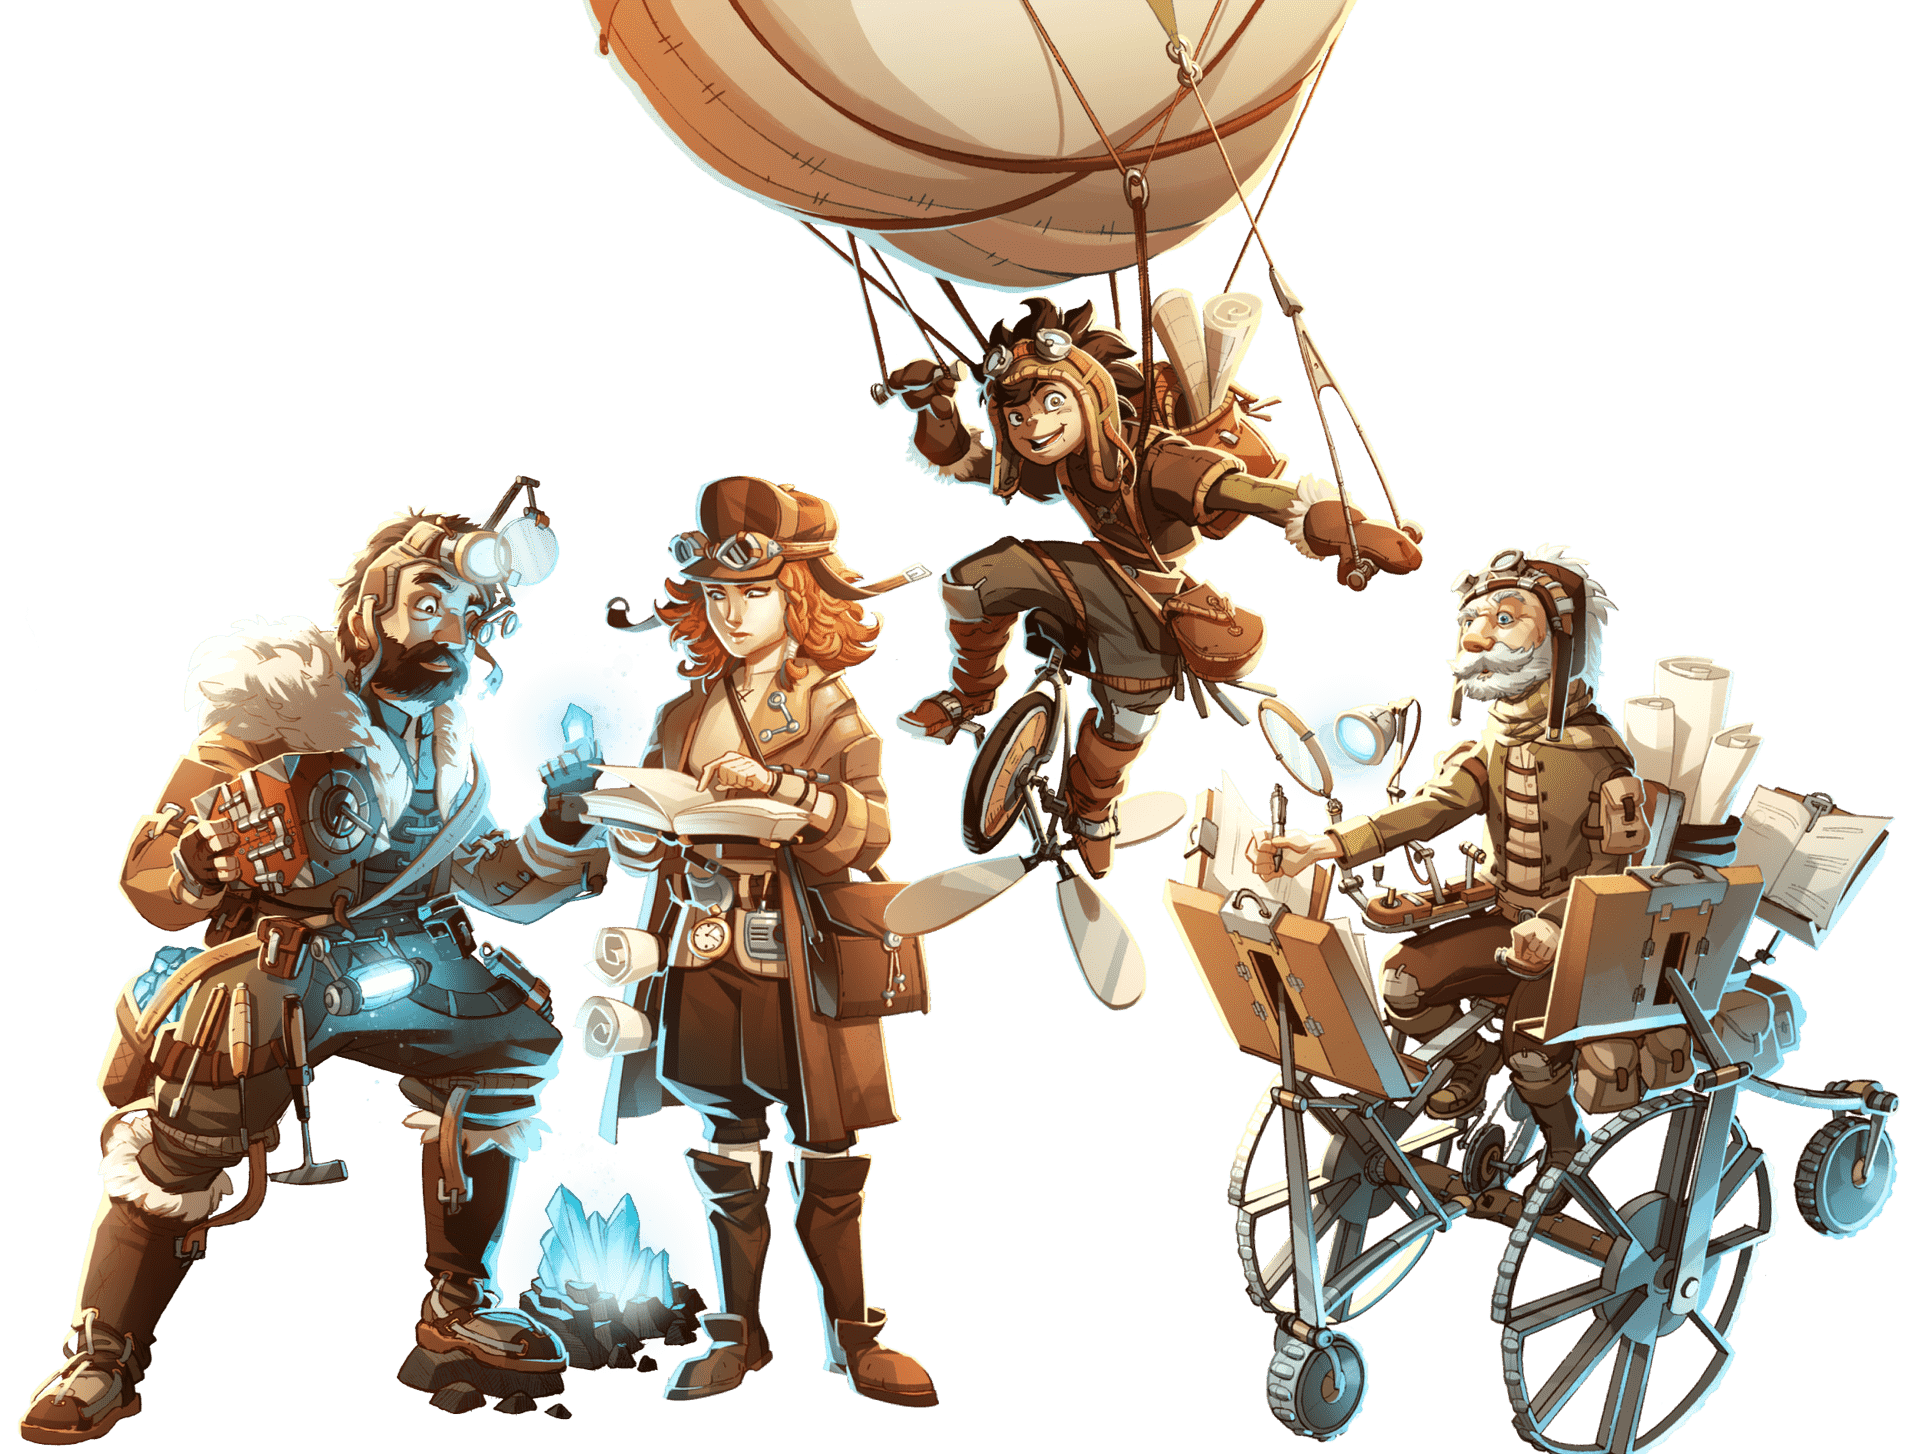 illustrazione colorata di 4 personagi di Soeliok: Nodfri, Eldur, Eira, Gaman